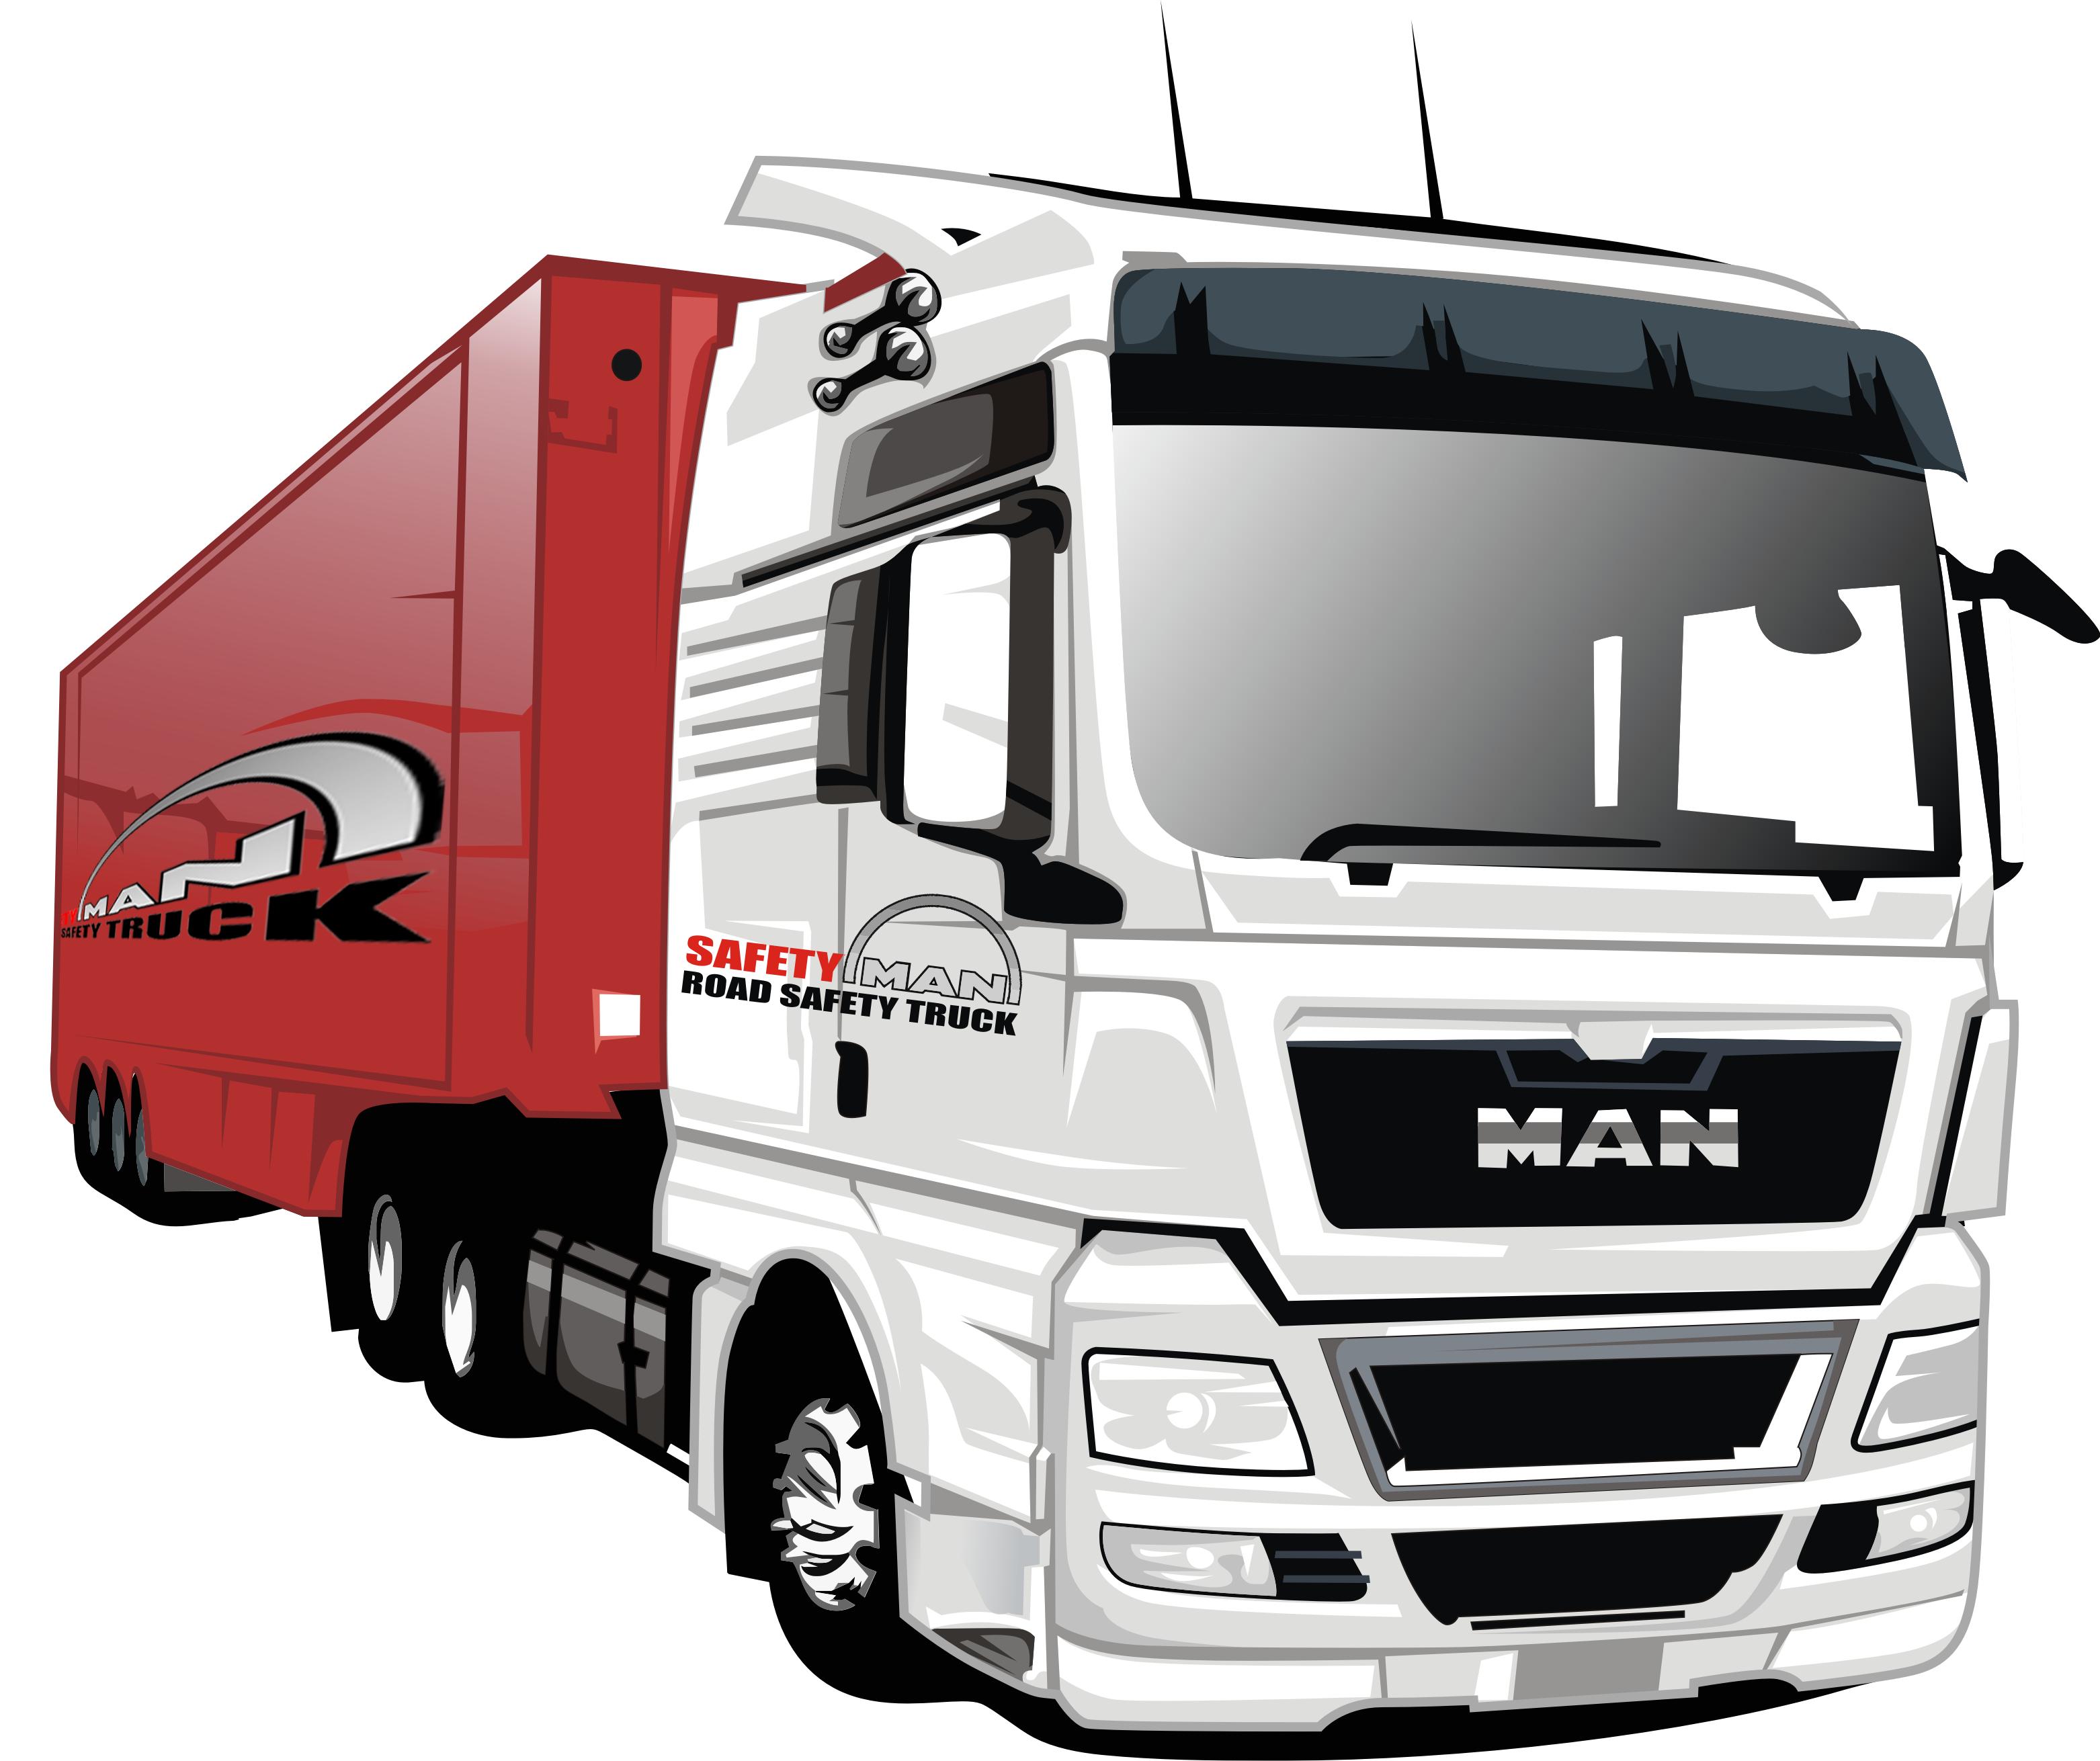 Man Truck Cartoon Style Truck Cars Truck Vector Cartoon